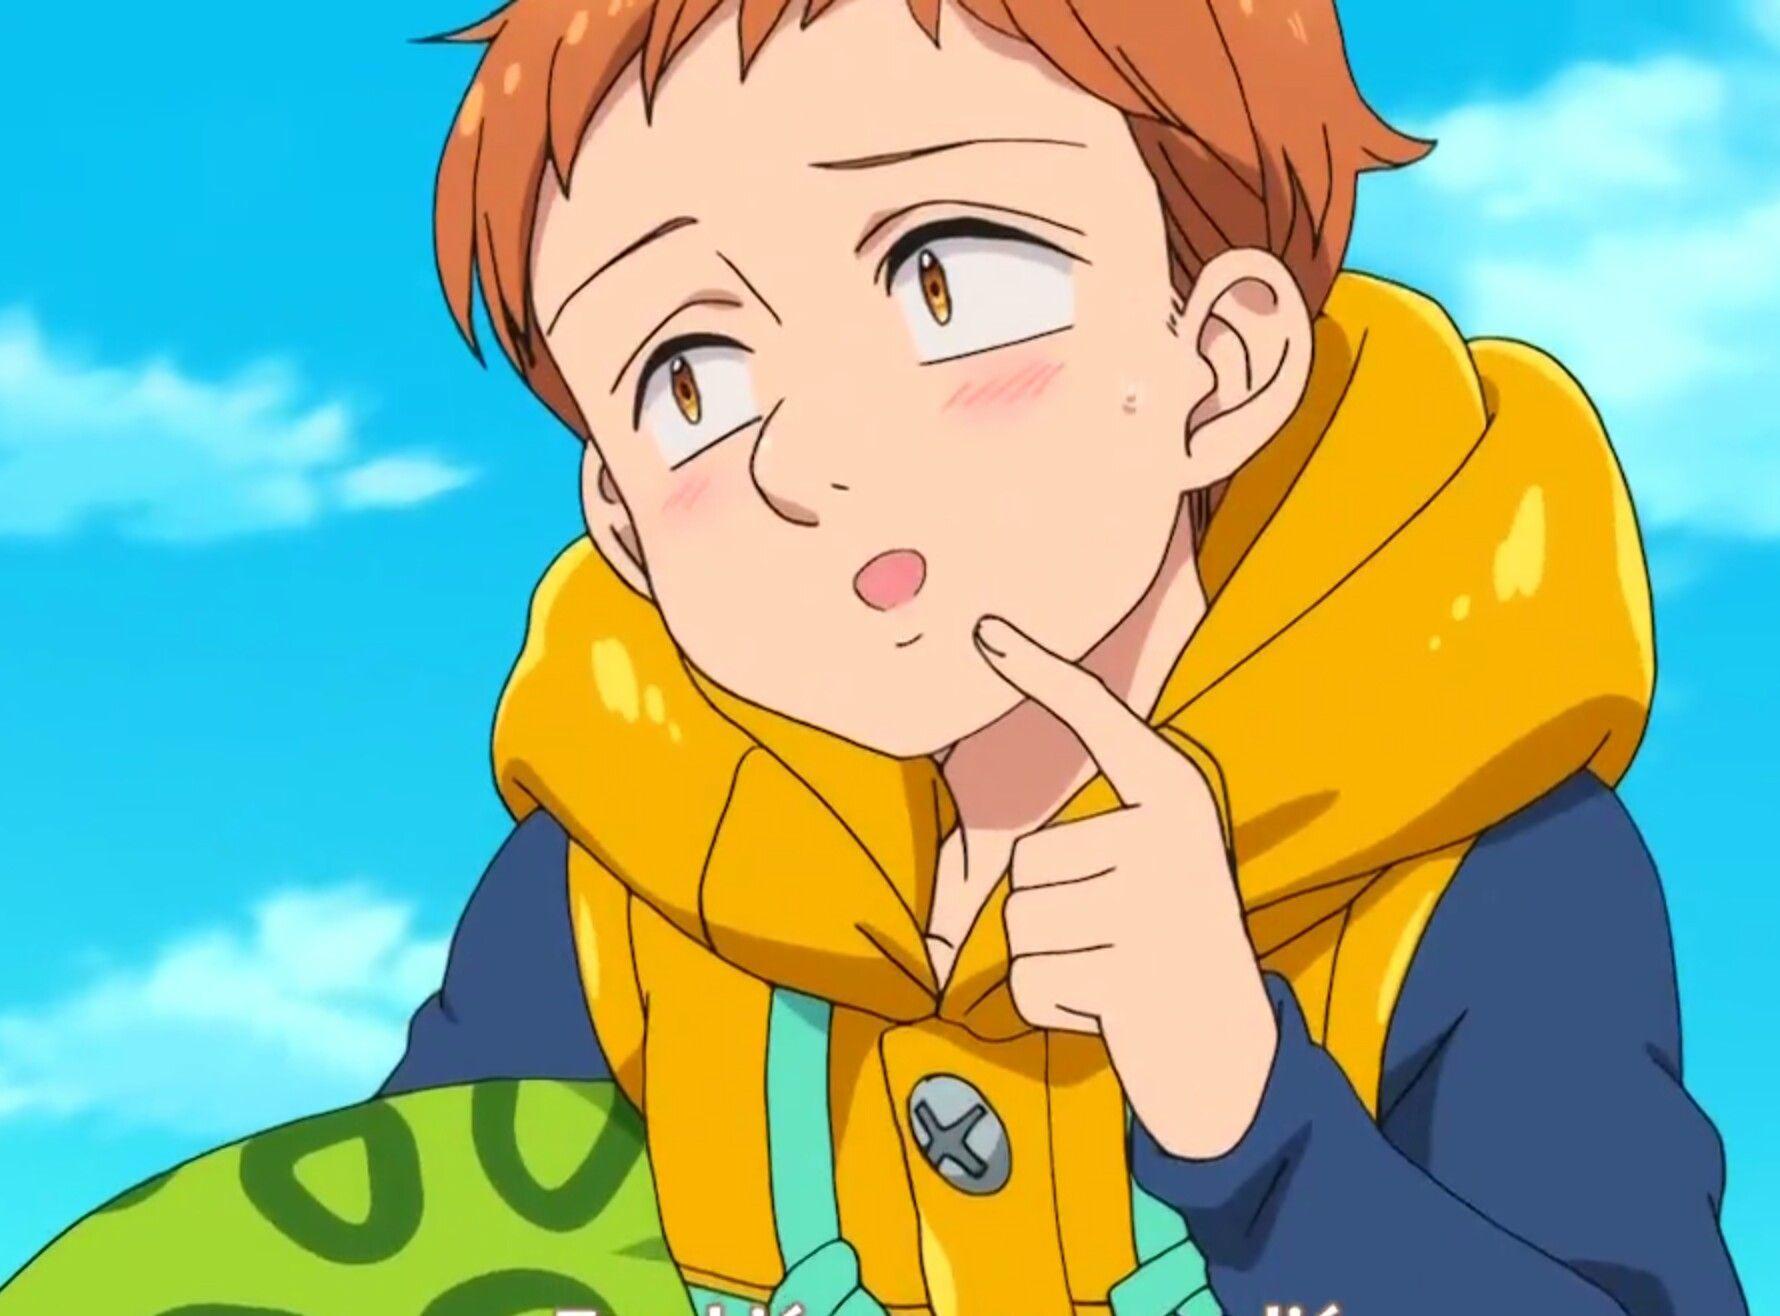 King Nanatsu No Taizai Imagenes Animadas Anime 7 Pecados Capitales 7 Pecados